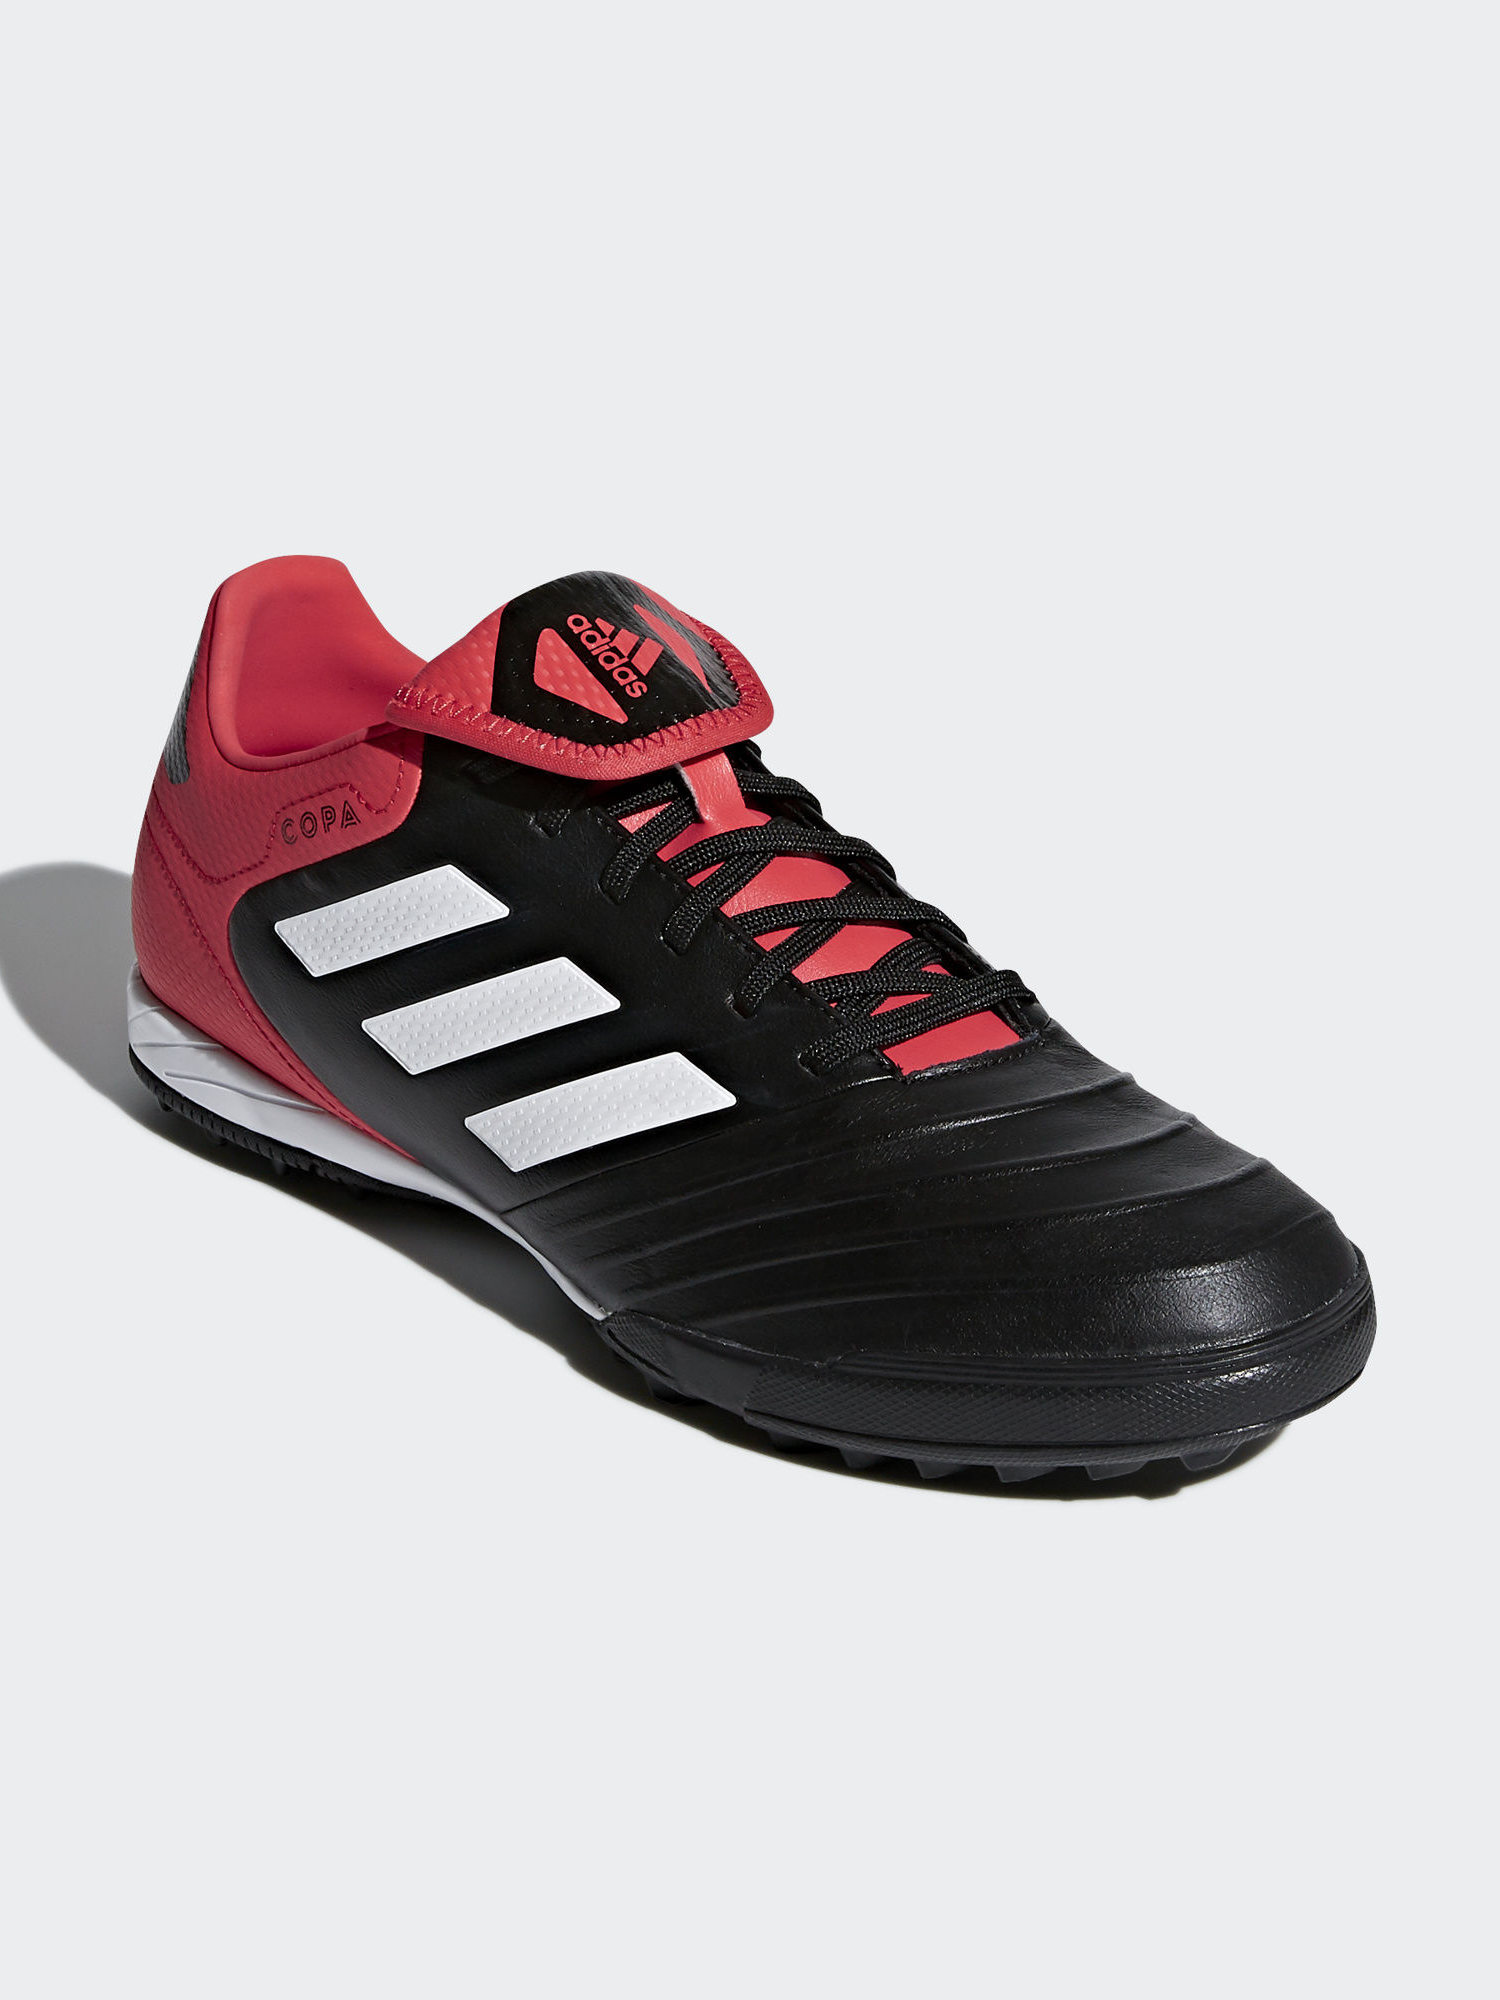 new styles fadb3 639f7 Football-shoes-Adidas-Copa-Tango-18-3-Noir-